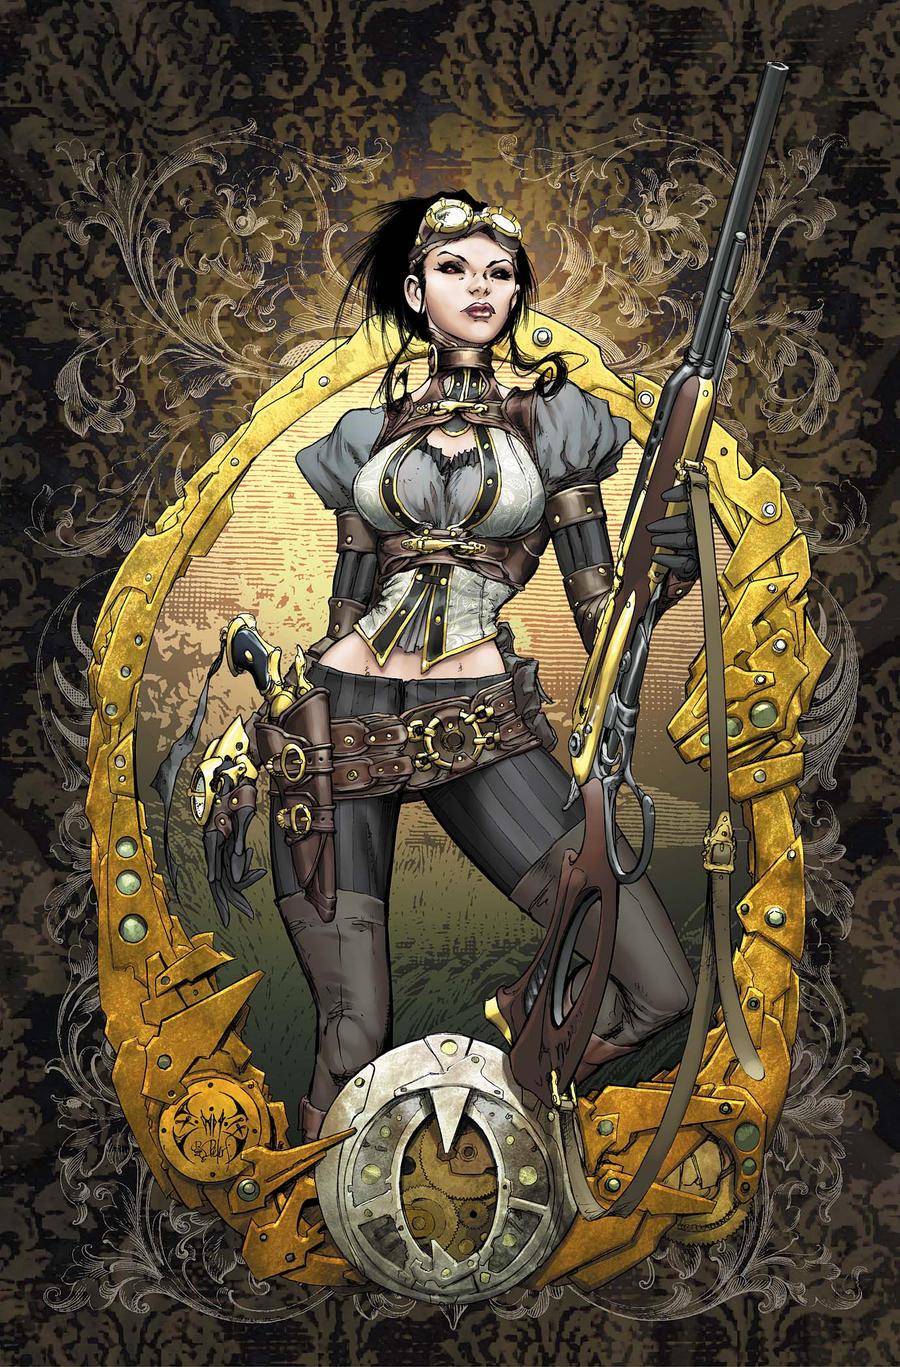 Lady Mechanika 0 Cover colors by joebenitez